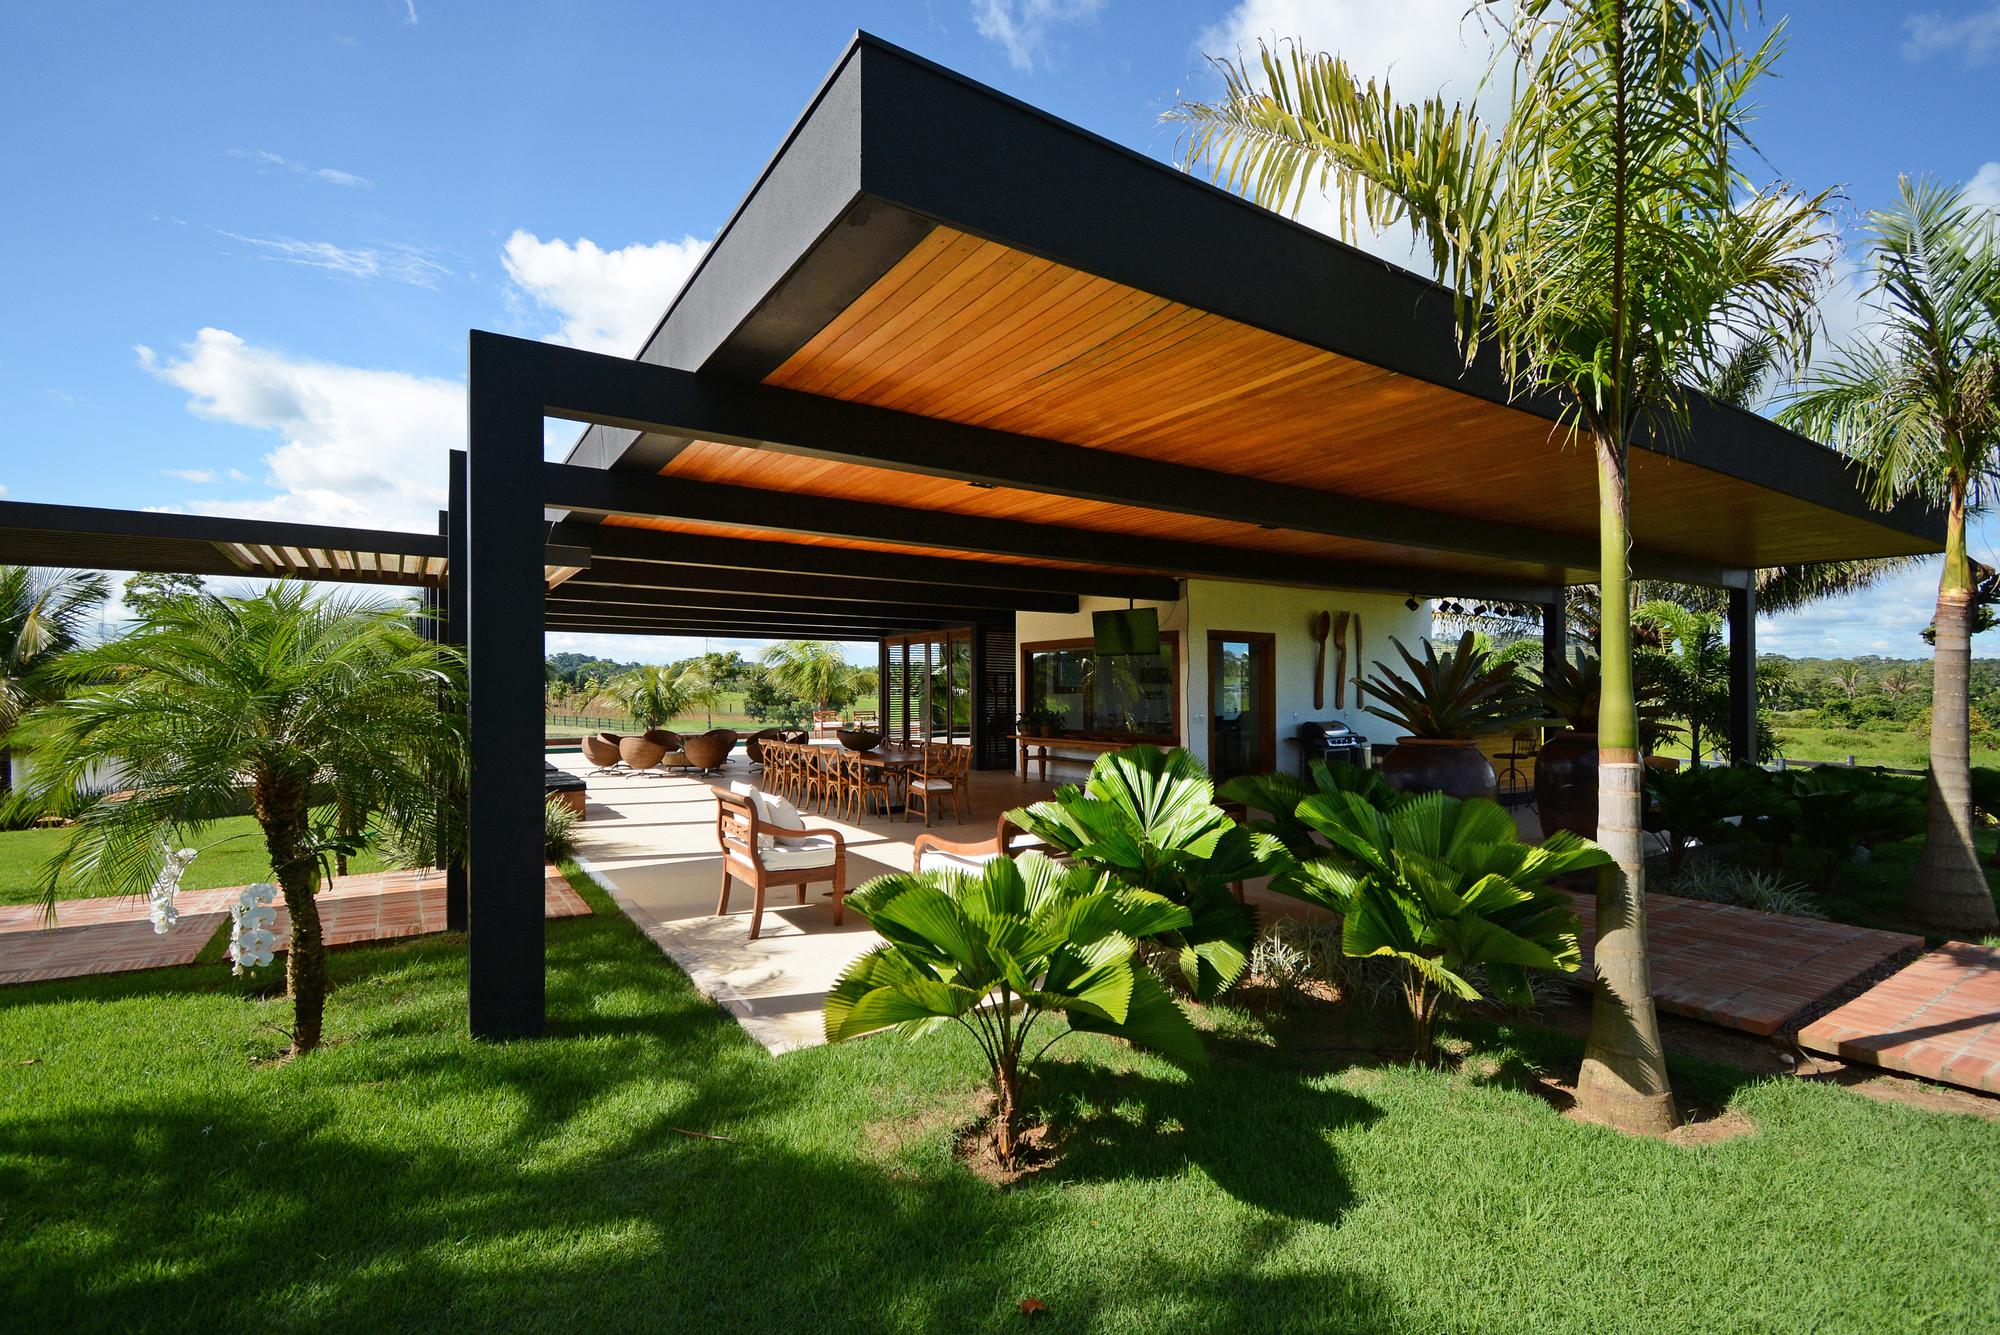 Lake House Extension / Rogoski Arquitetura